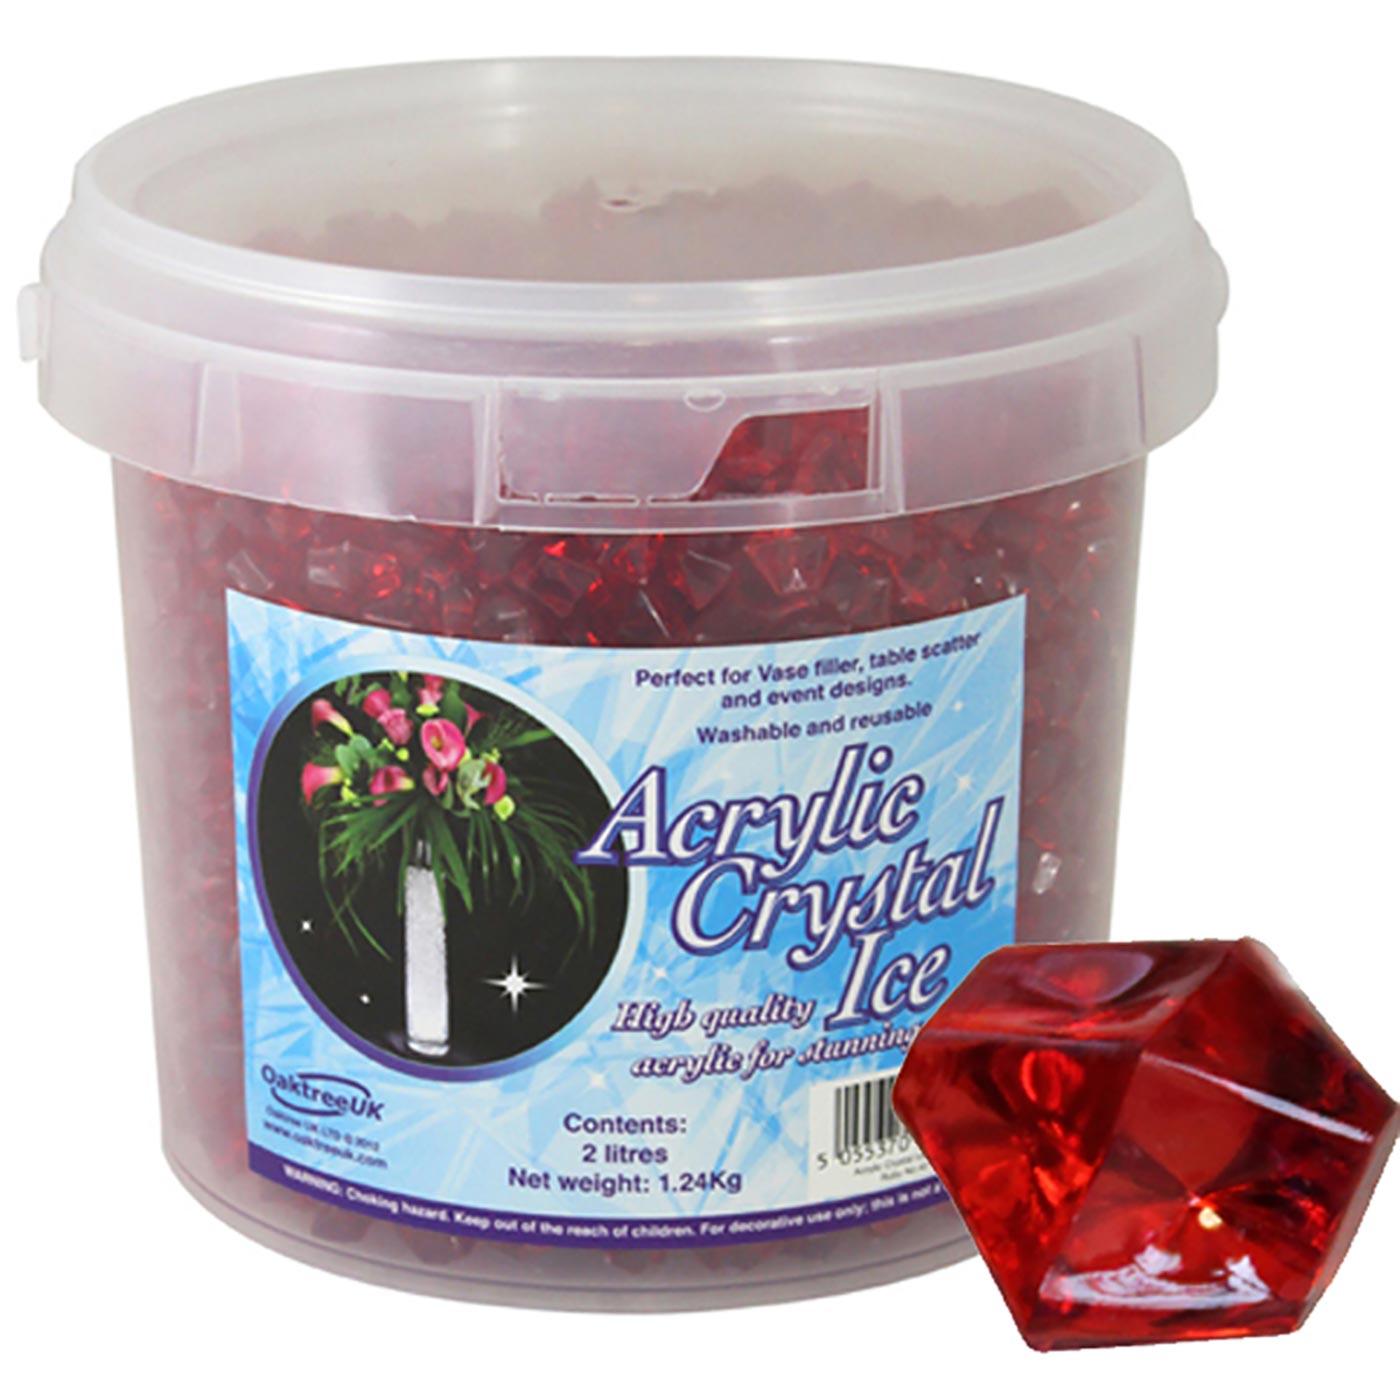 Acrylic Crystal Ice 1.4cm 2ltr 1.24Kg Ruby